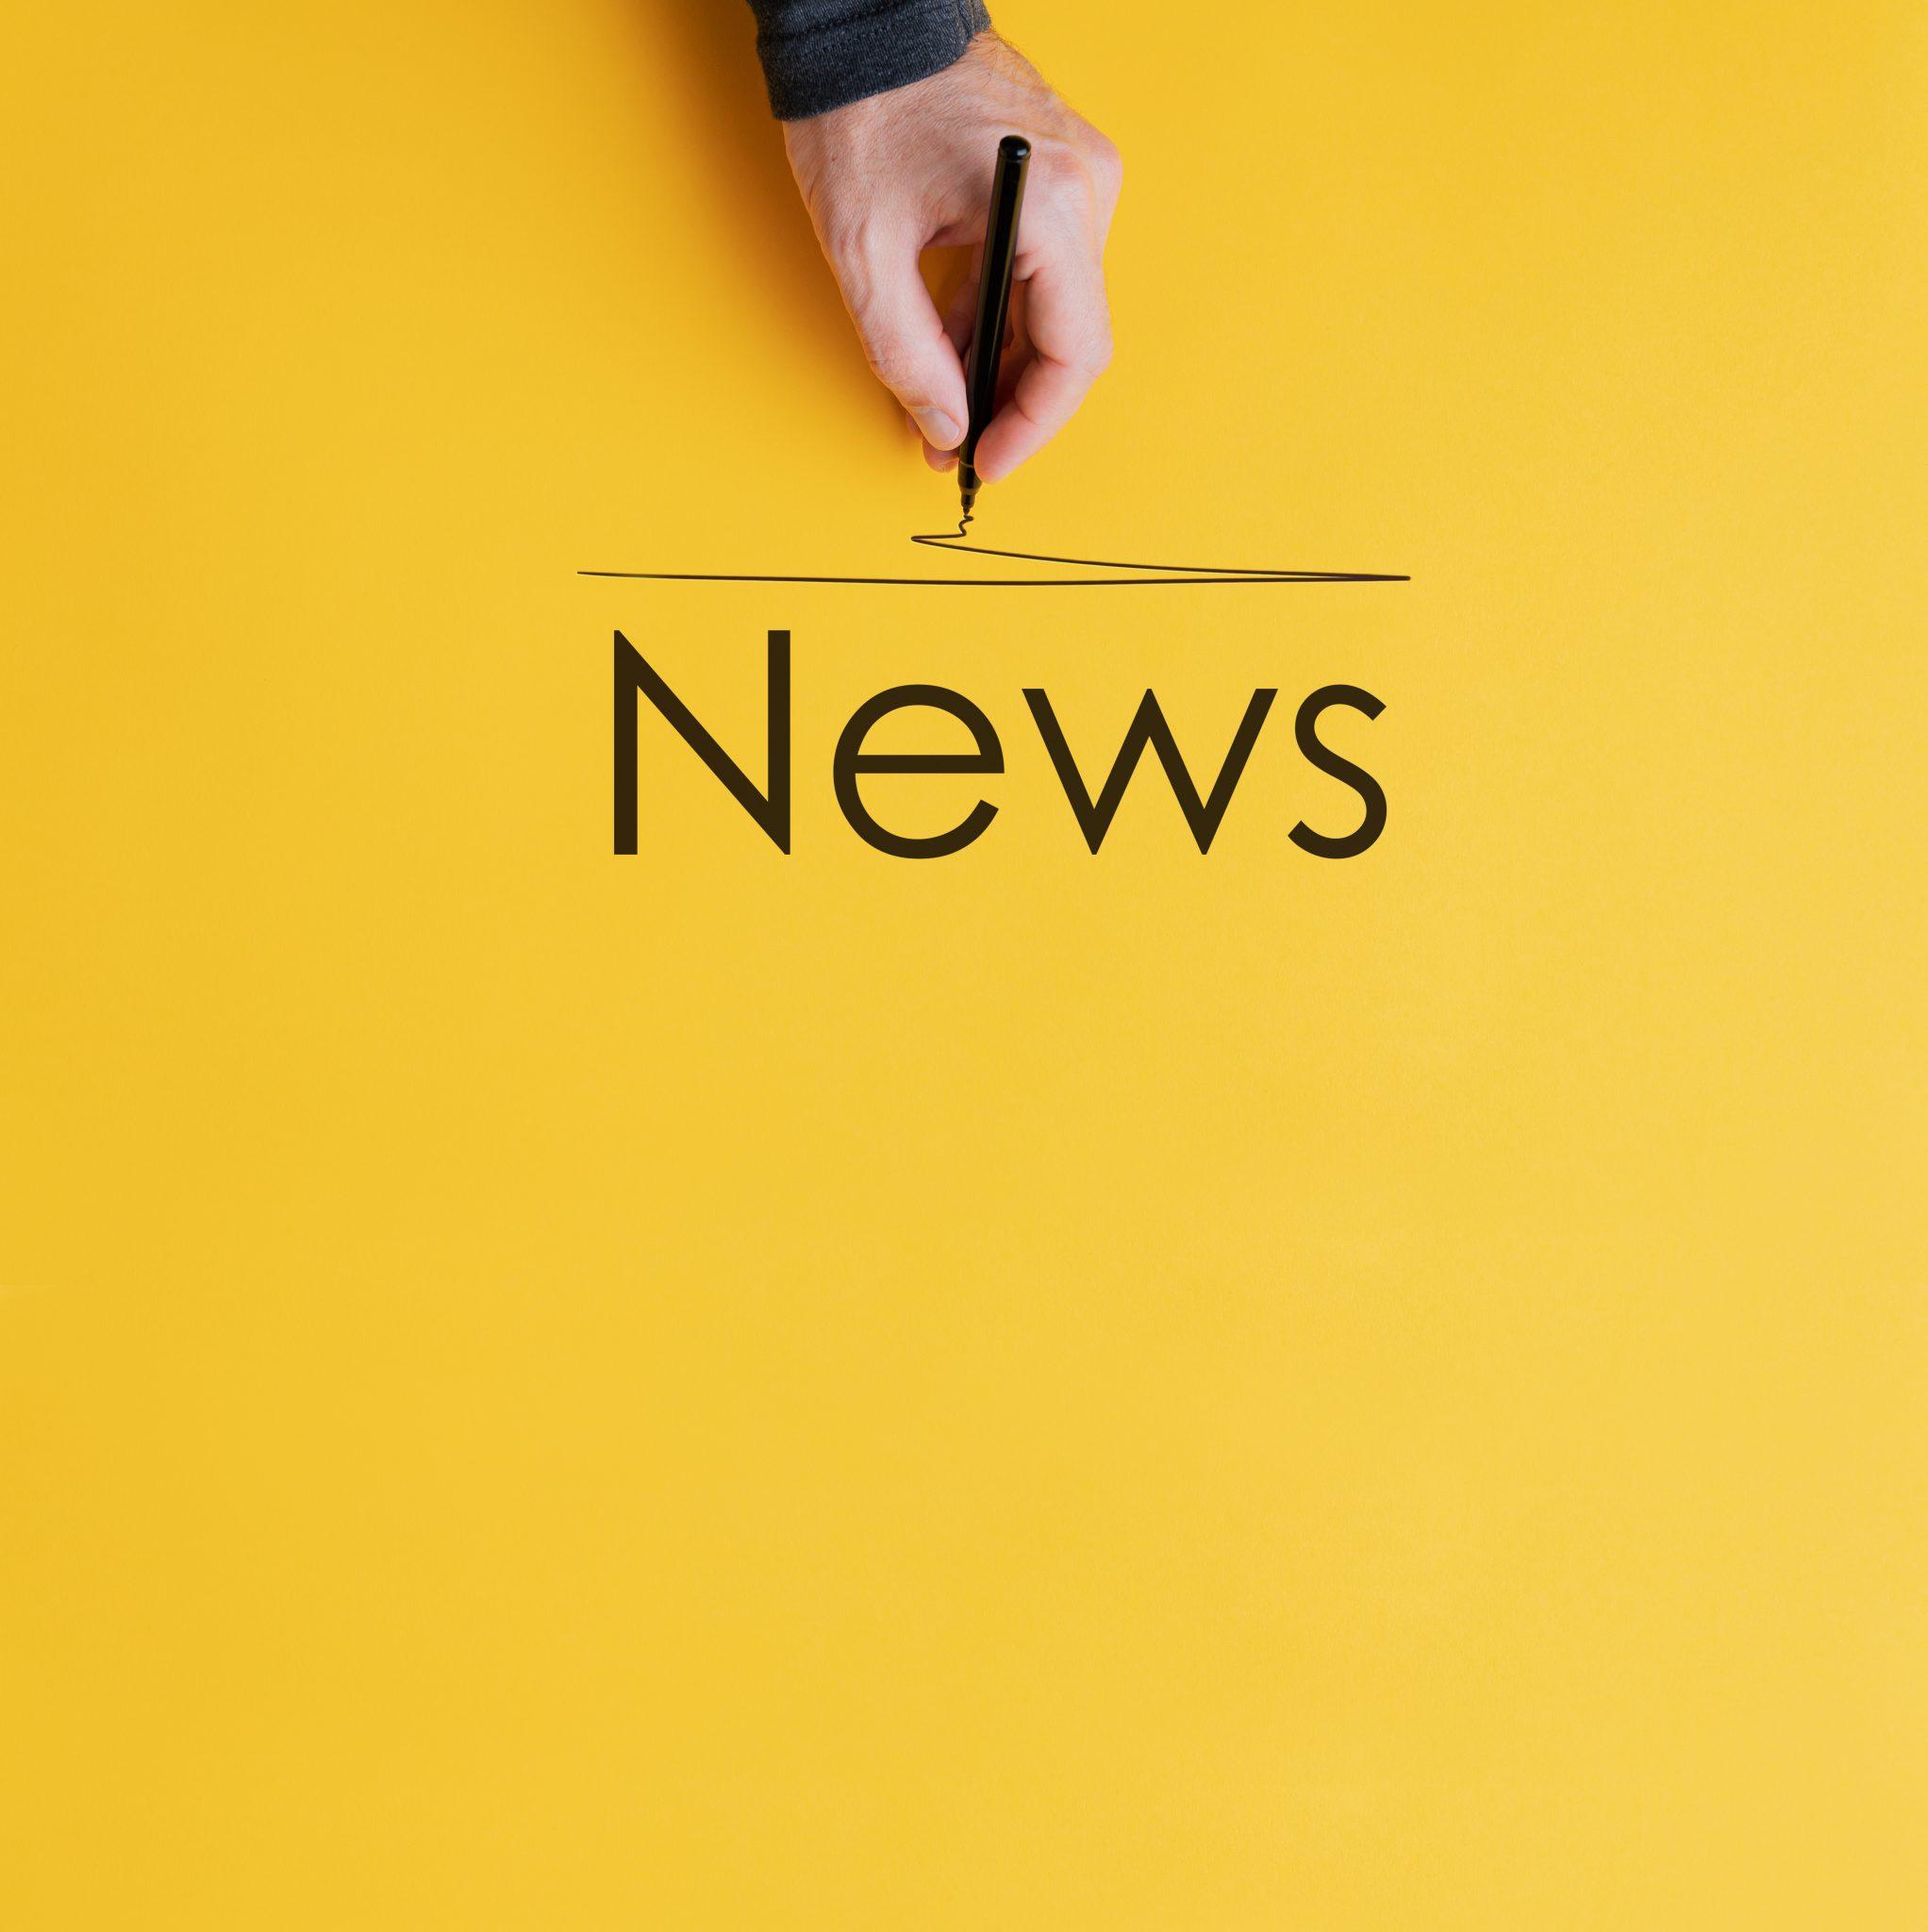 Nitti News